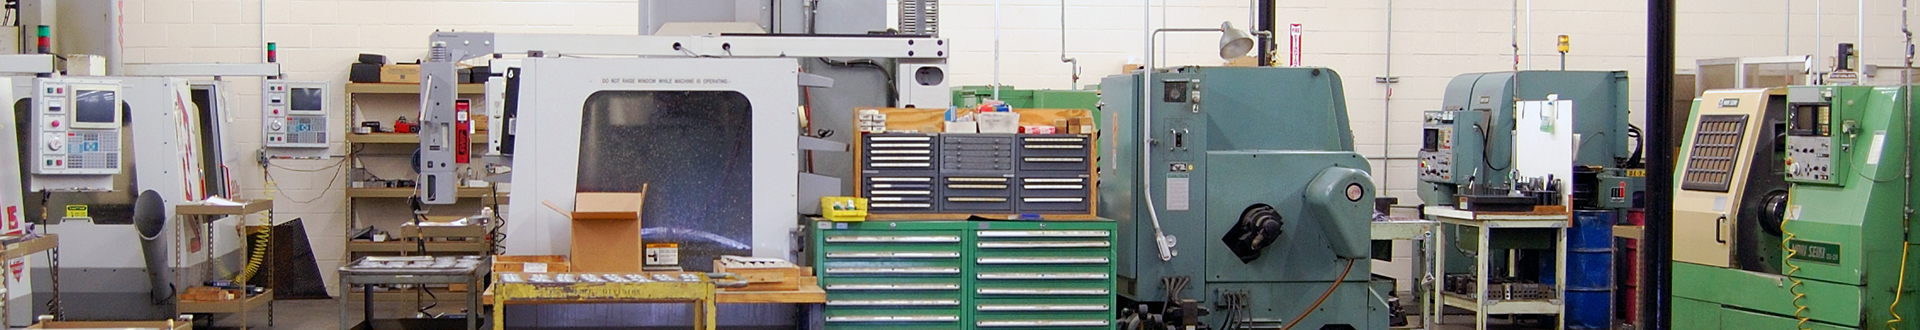 n and p precision machine shop floor